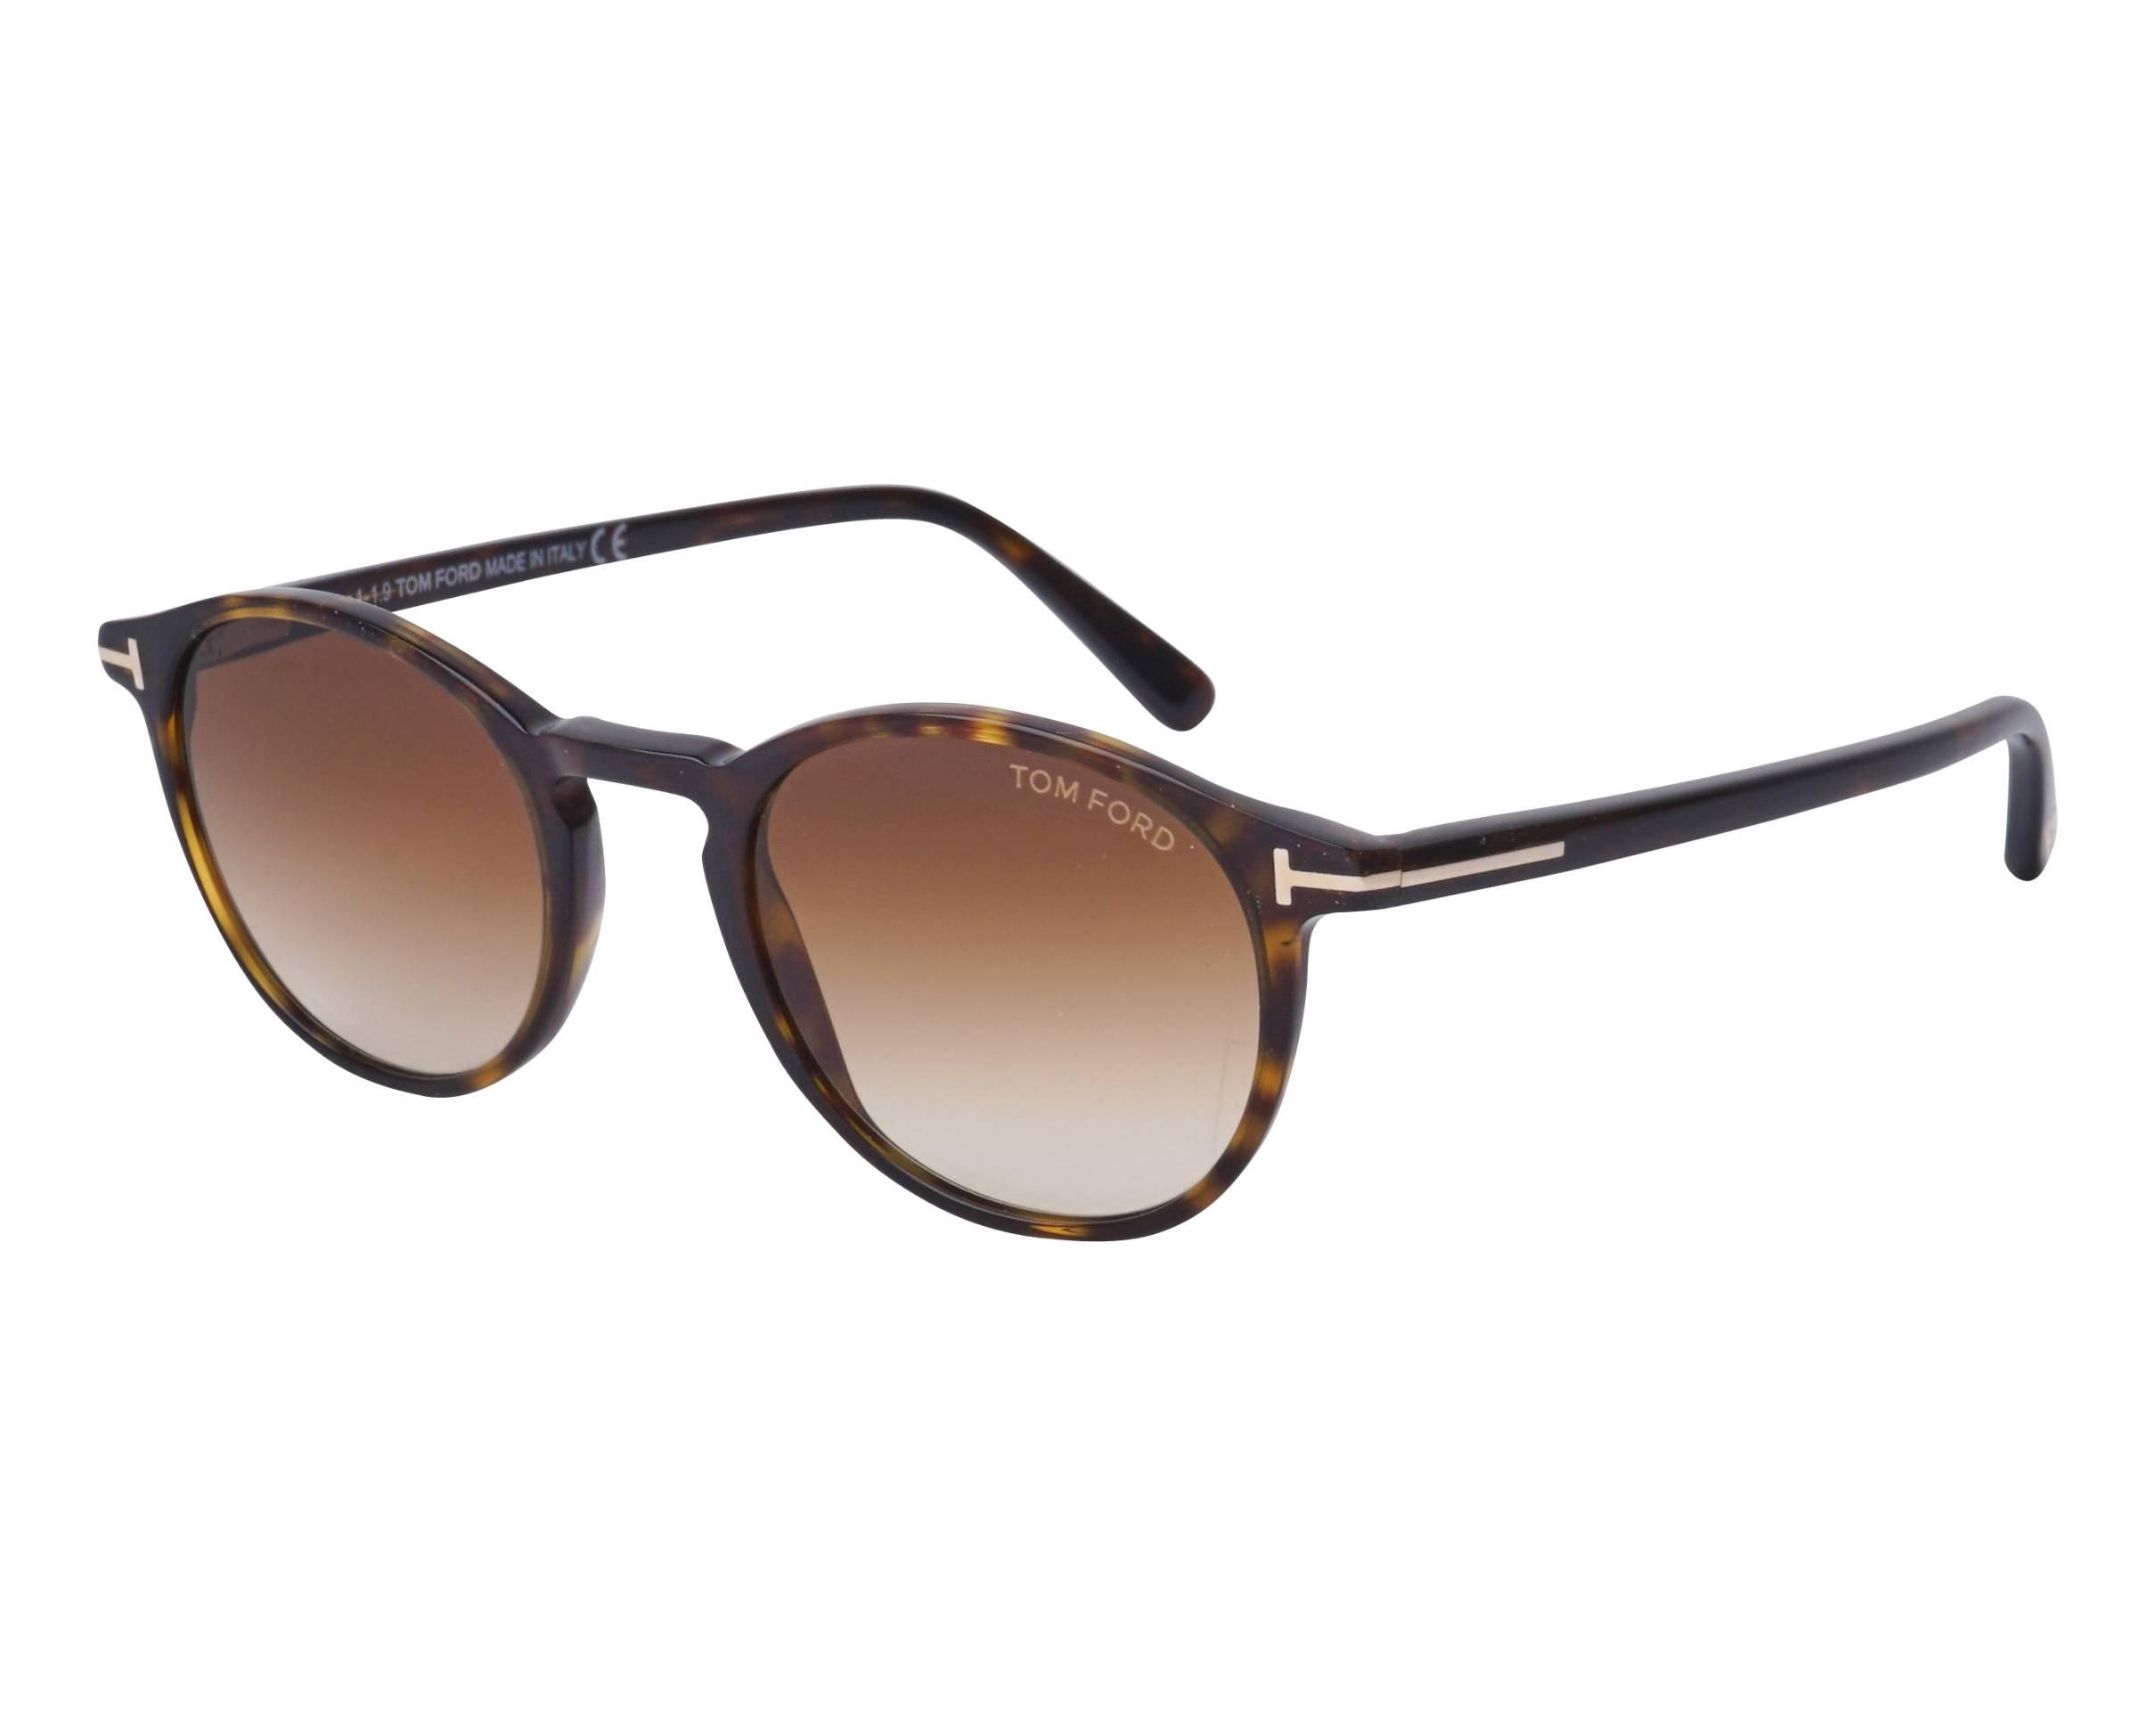 Tom Ford Sunglasses Andrea 02 Tf 0539 52f